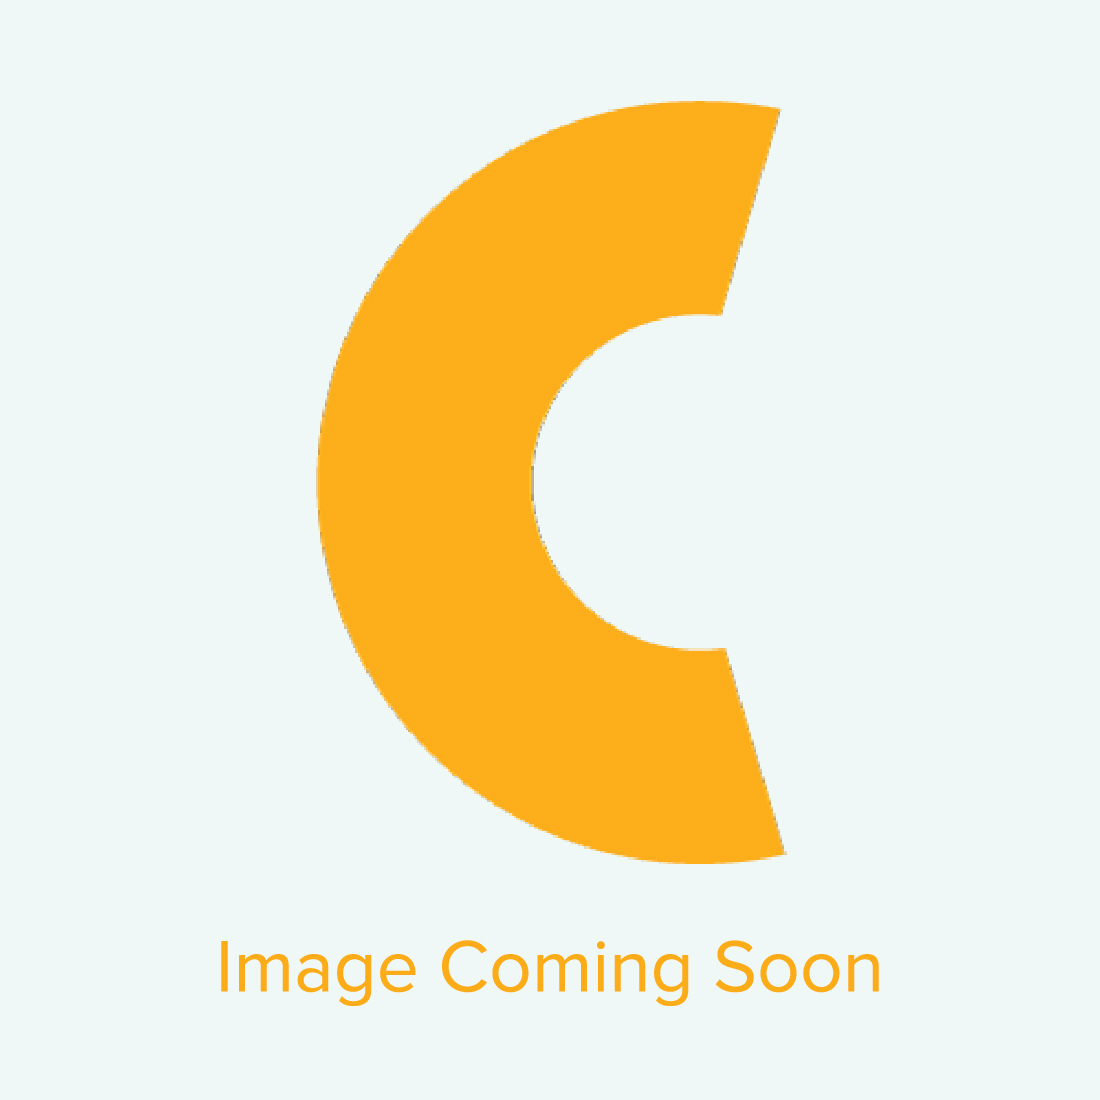 OKI Data Pro 920WT/910 Replacement Transfer Belt